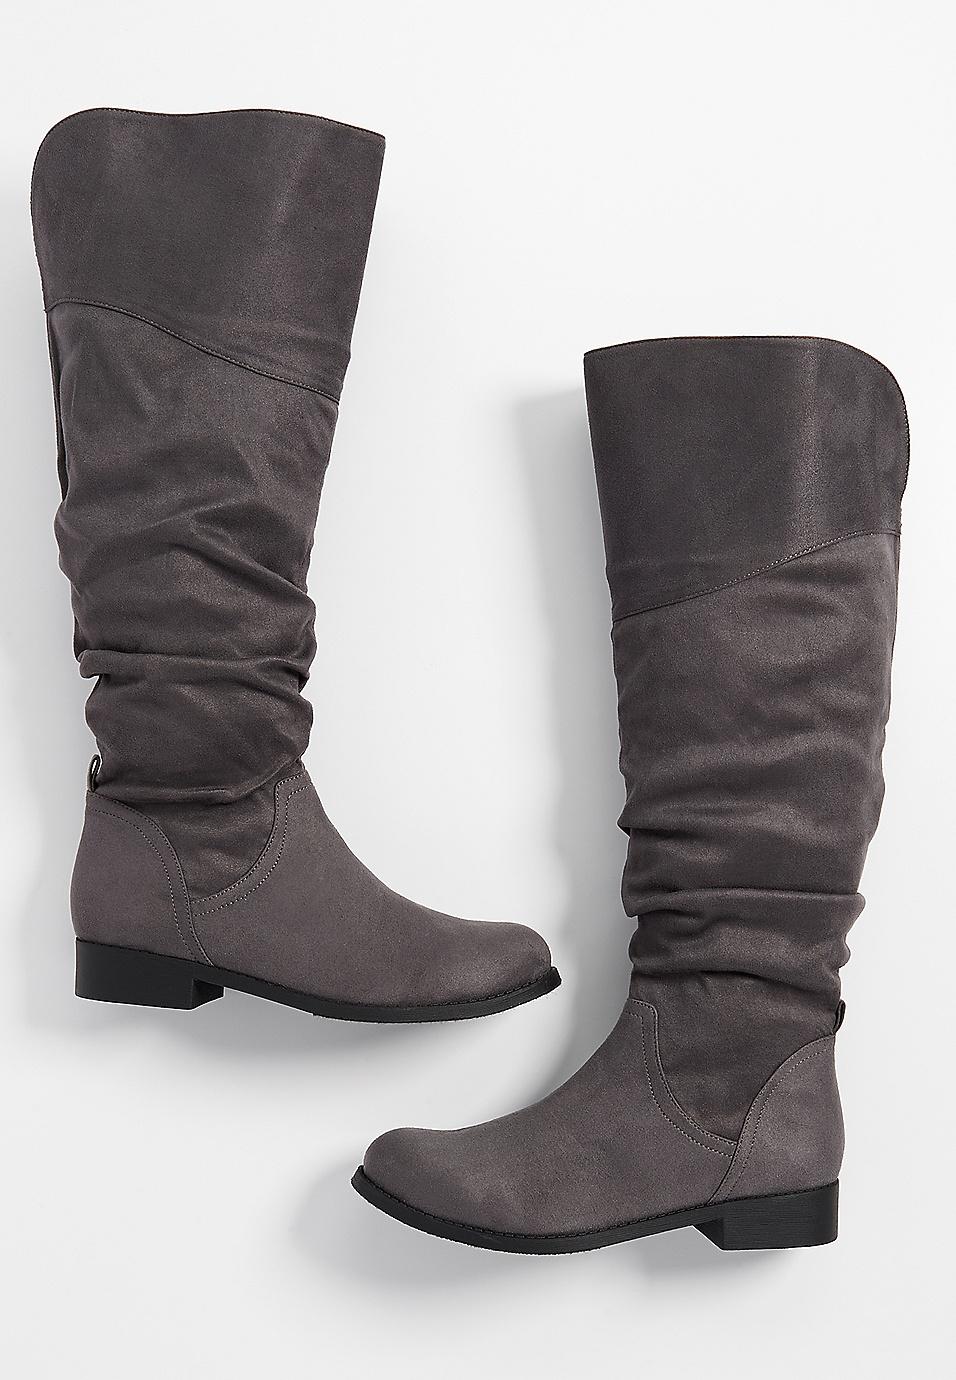 8080f53c73e Greta scrunch tall boot